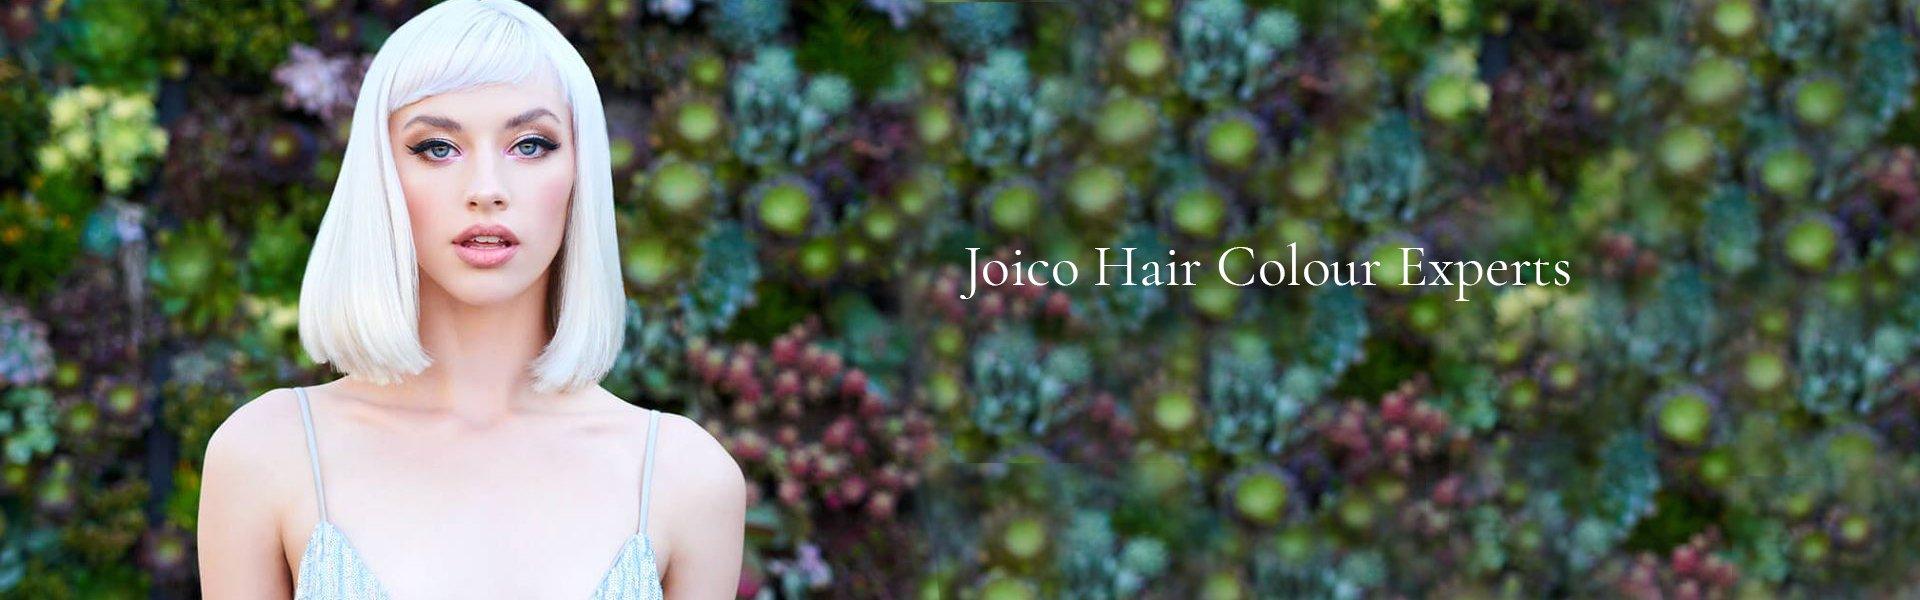 Joico Hair Colour Experts Wantage & Didcot Hair Salons